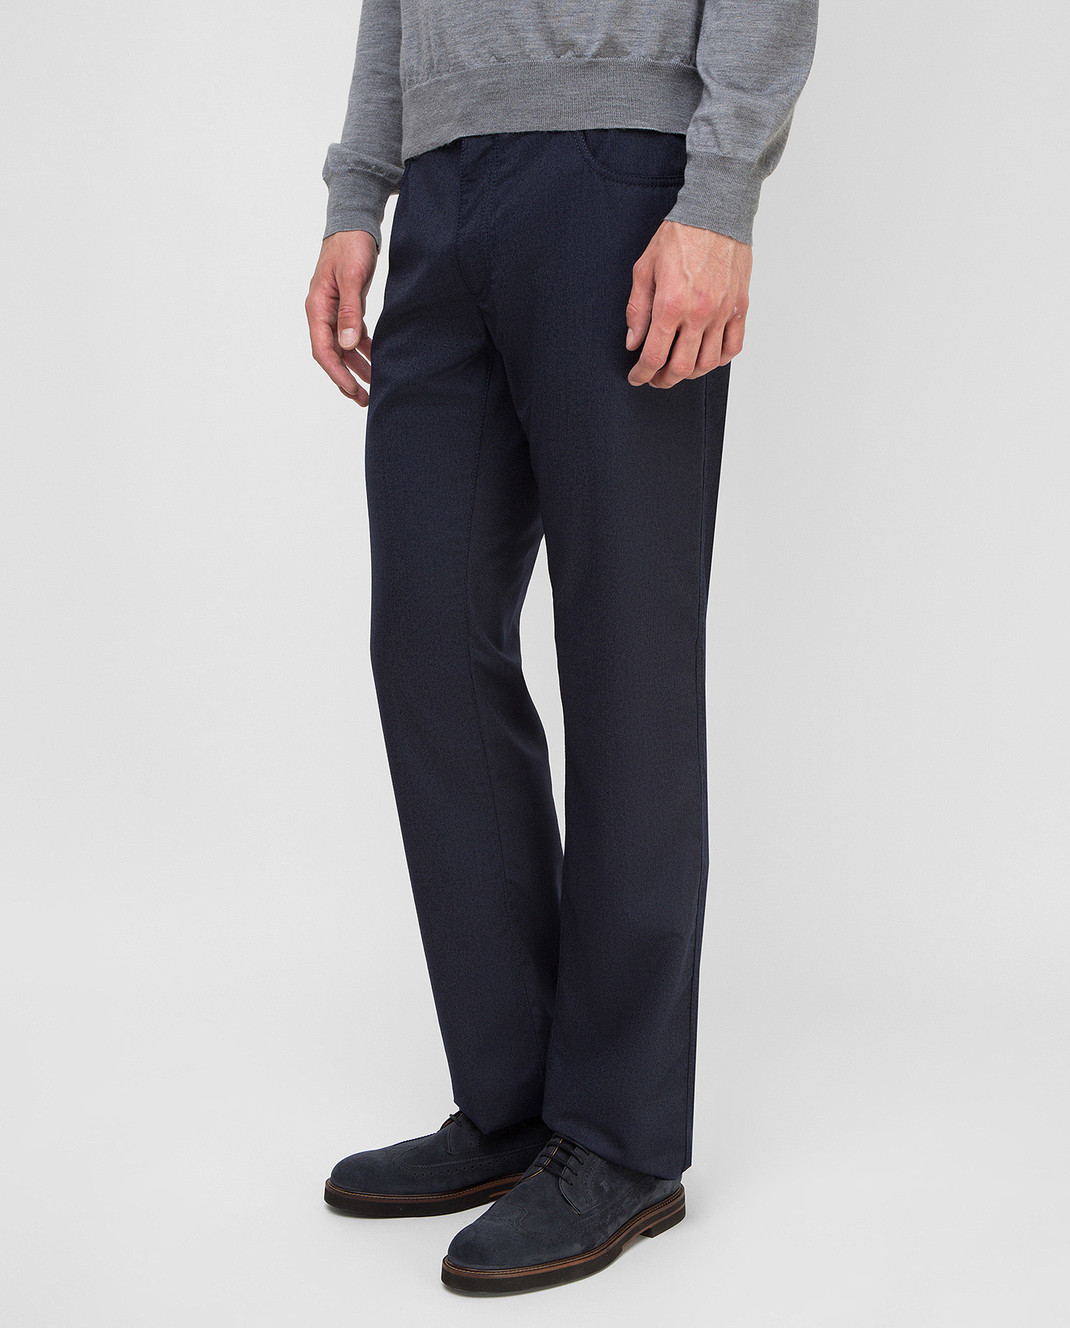 Castello d'Oro Темно-синие брюки из шерсти изображение 3